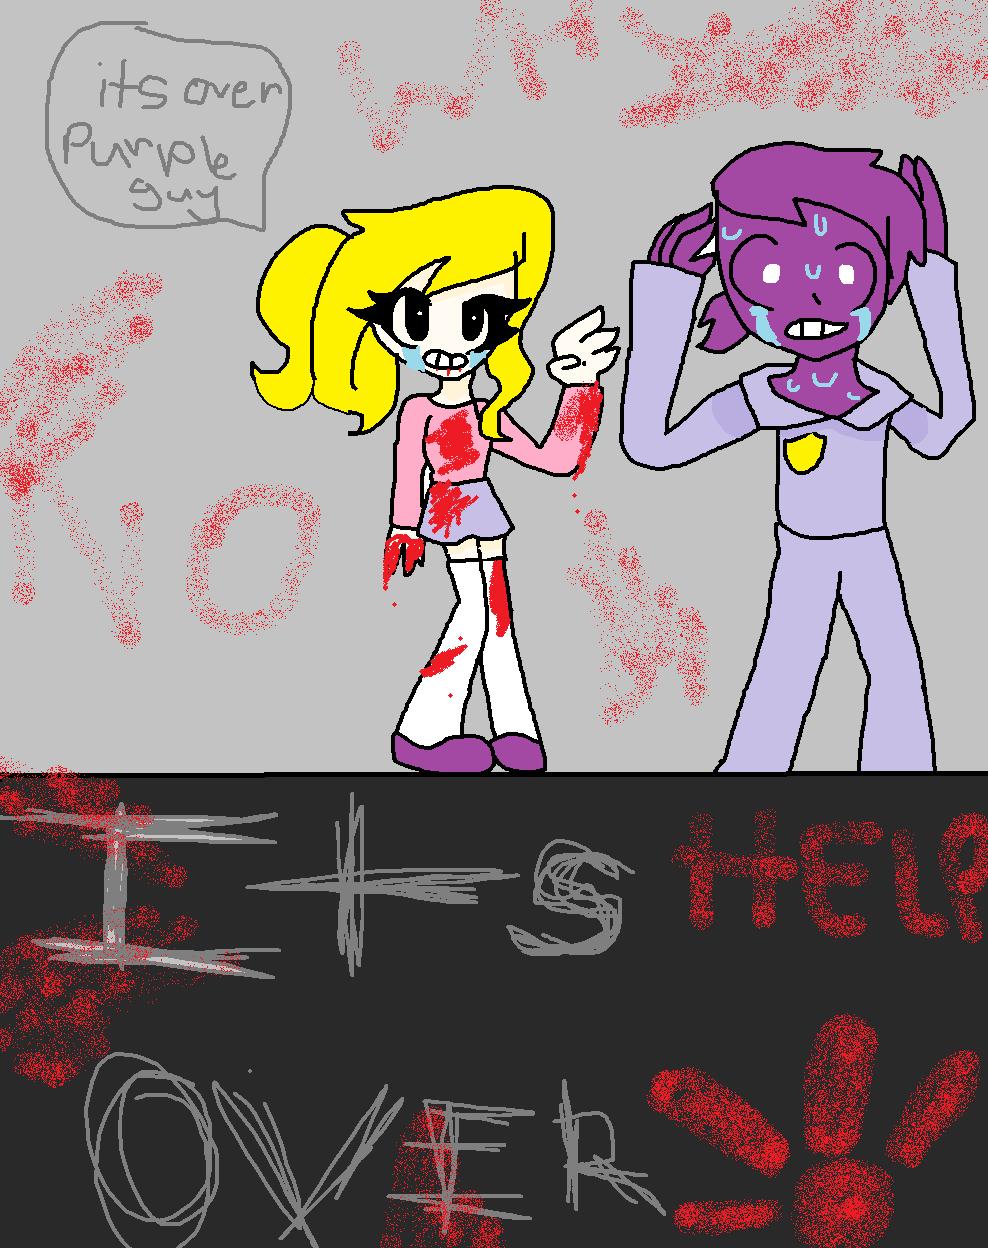 Its over purple guy fnaf 3 minigame by imsofancyasever on deviantart